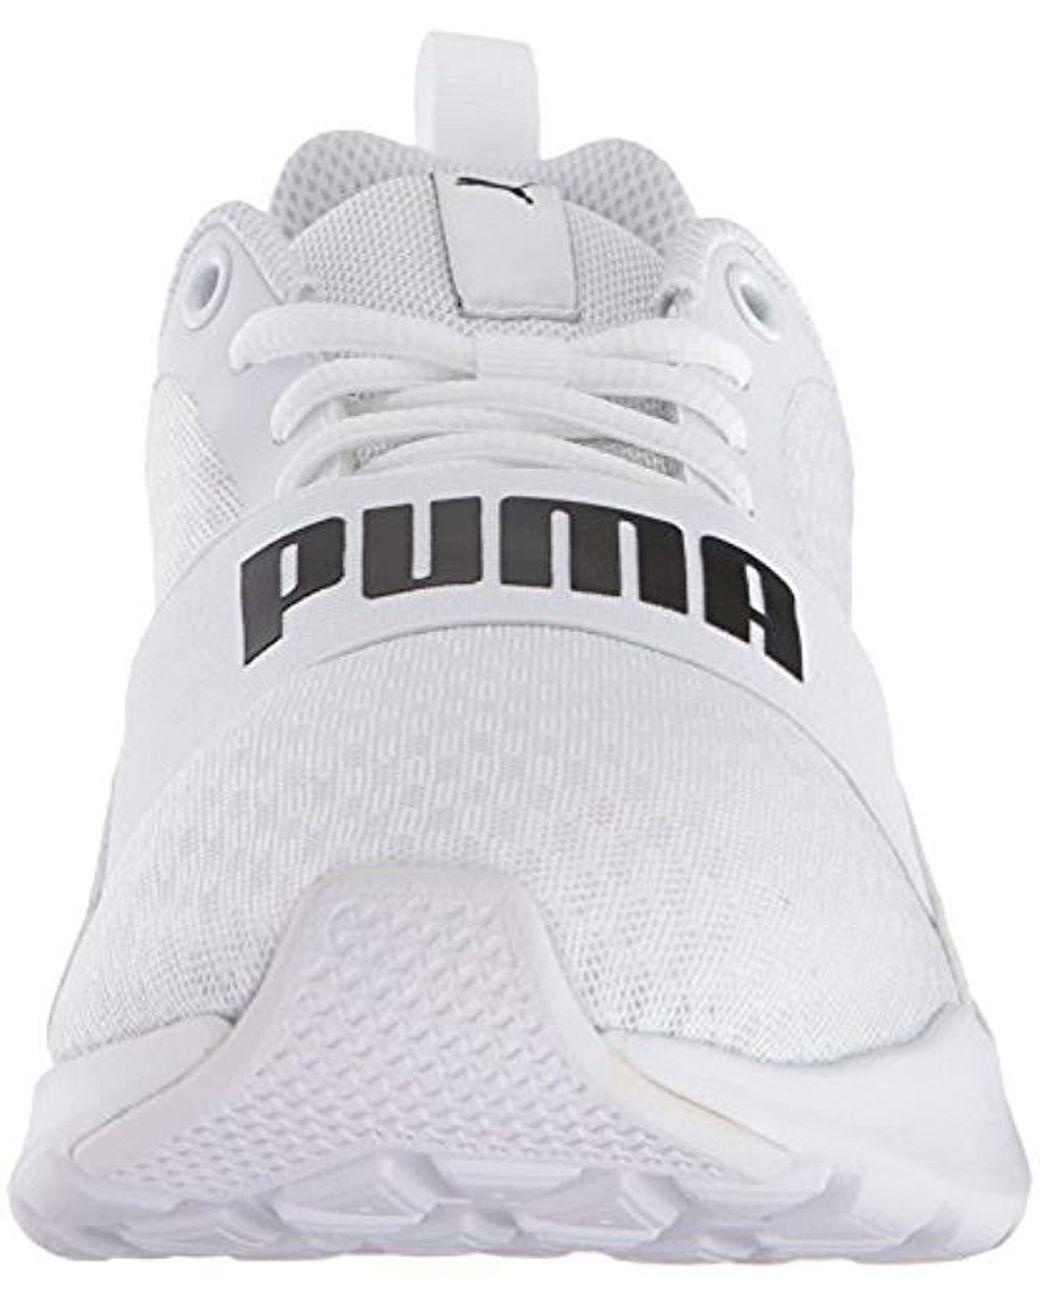 PUMA Enzo Women Men Oliver White Running Shoes Top Deals